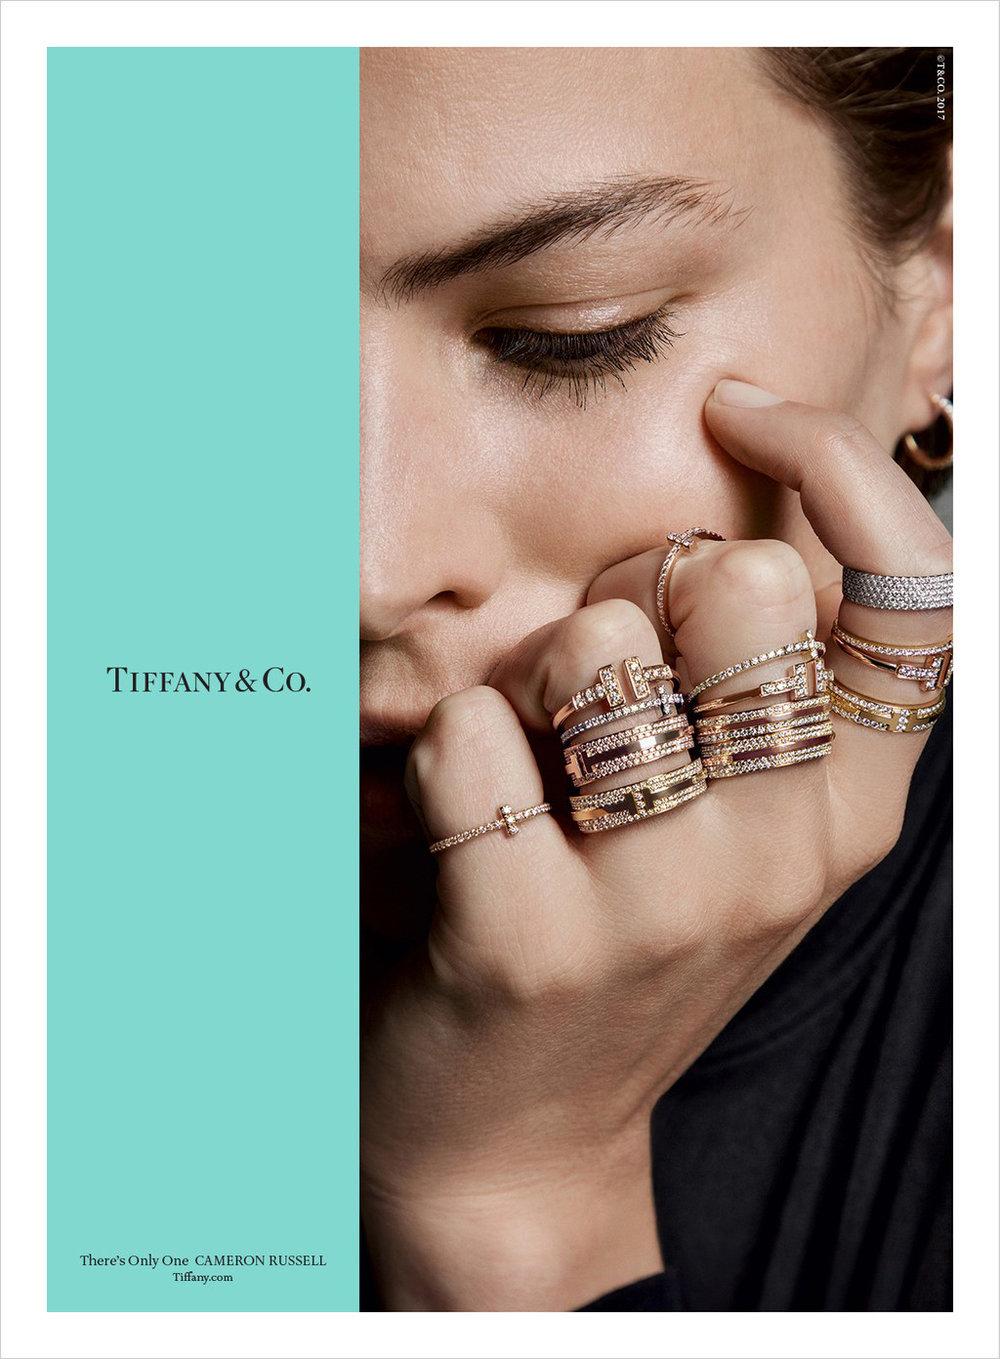 Tiffany-and-co-fall-2017-ad-campaign-the-impression-007.jpg